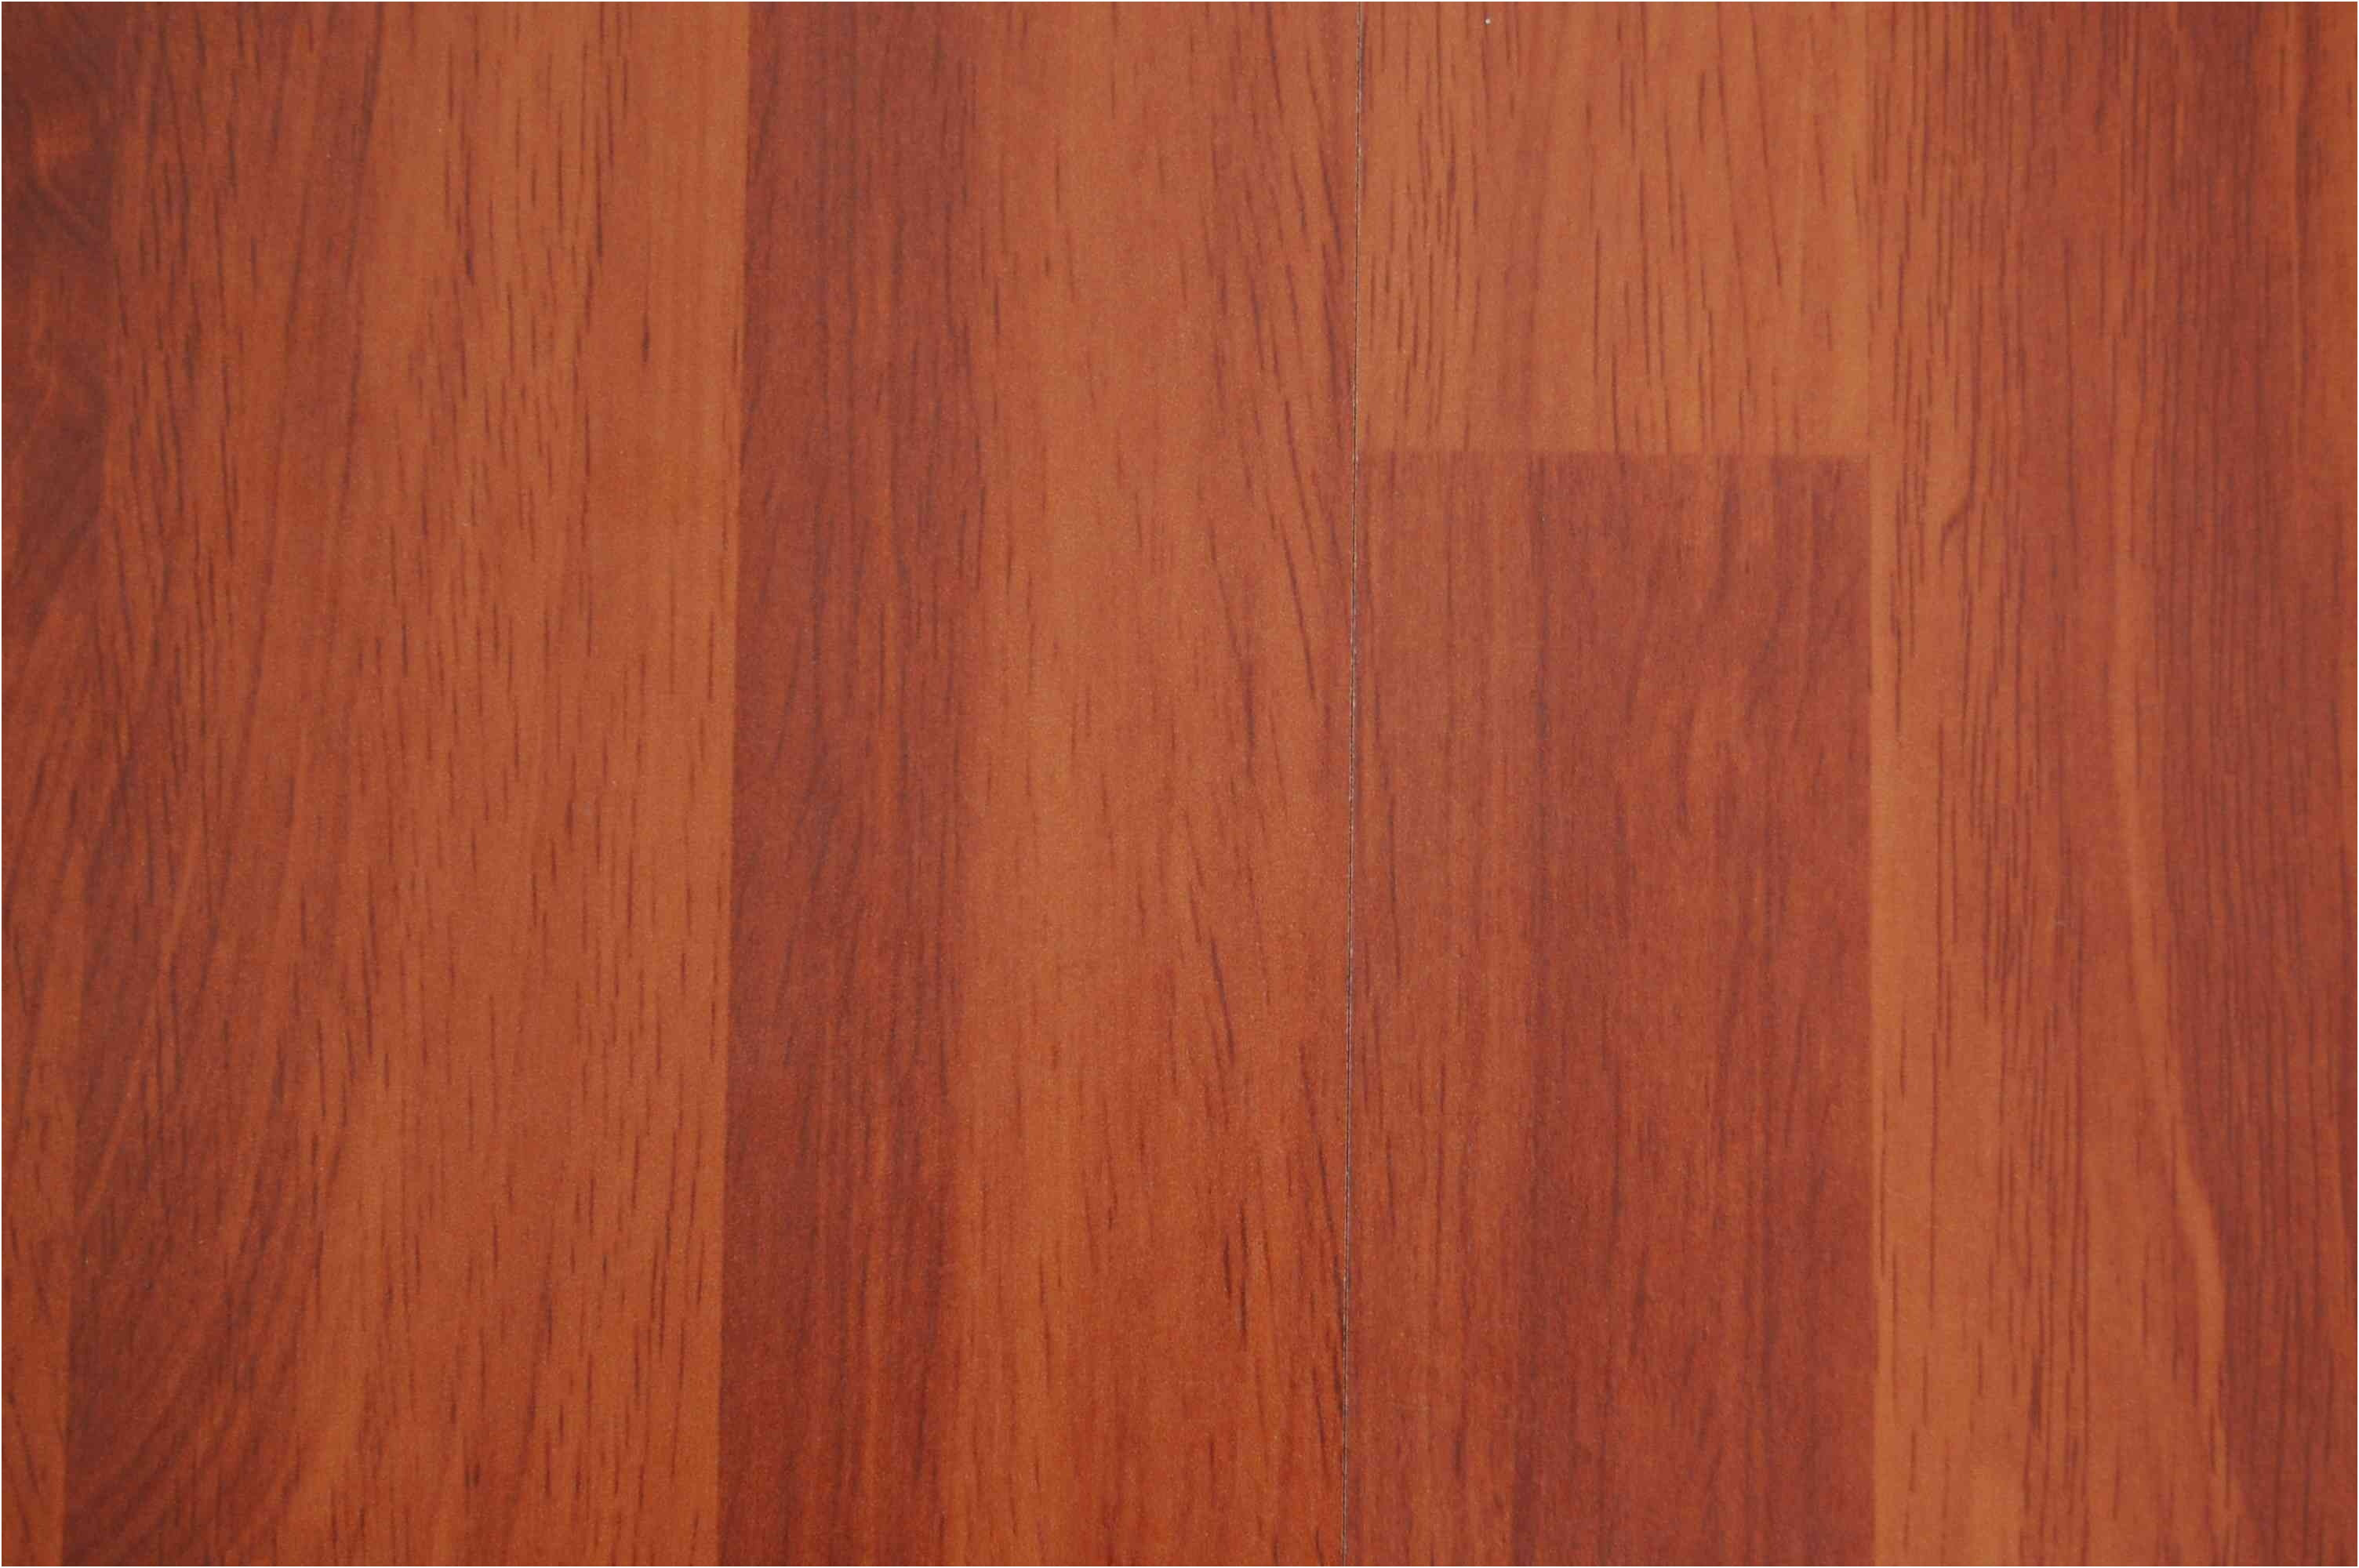 menards hardwood flooring sale of home depot hardwood flooring installation cost lovely best laminate with regard to home depot hardwood flooring installation cost luxury best laminate flooring for kitchen how thick should i